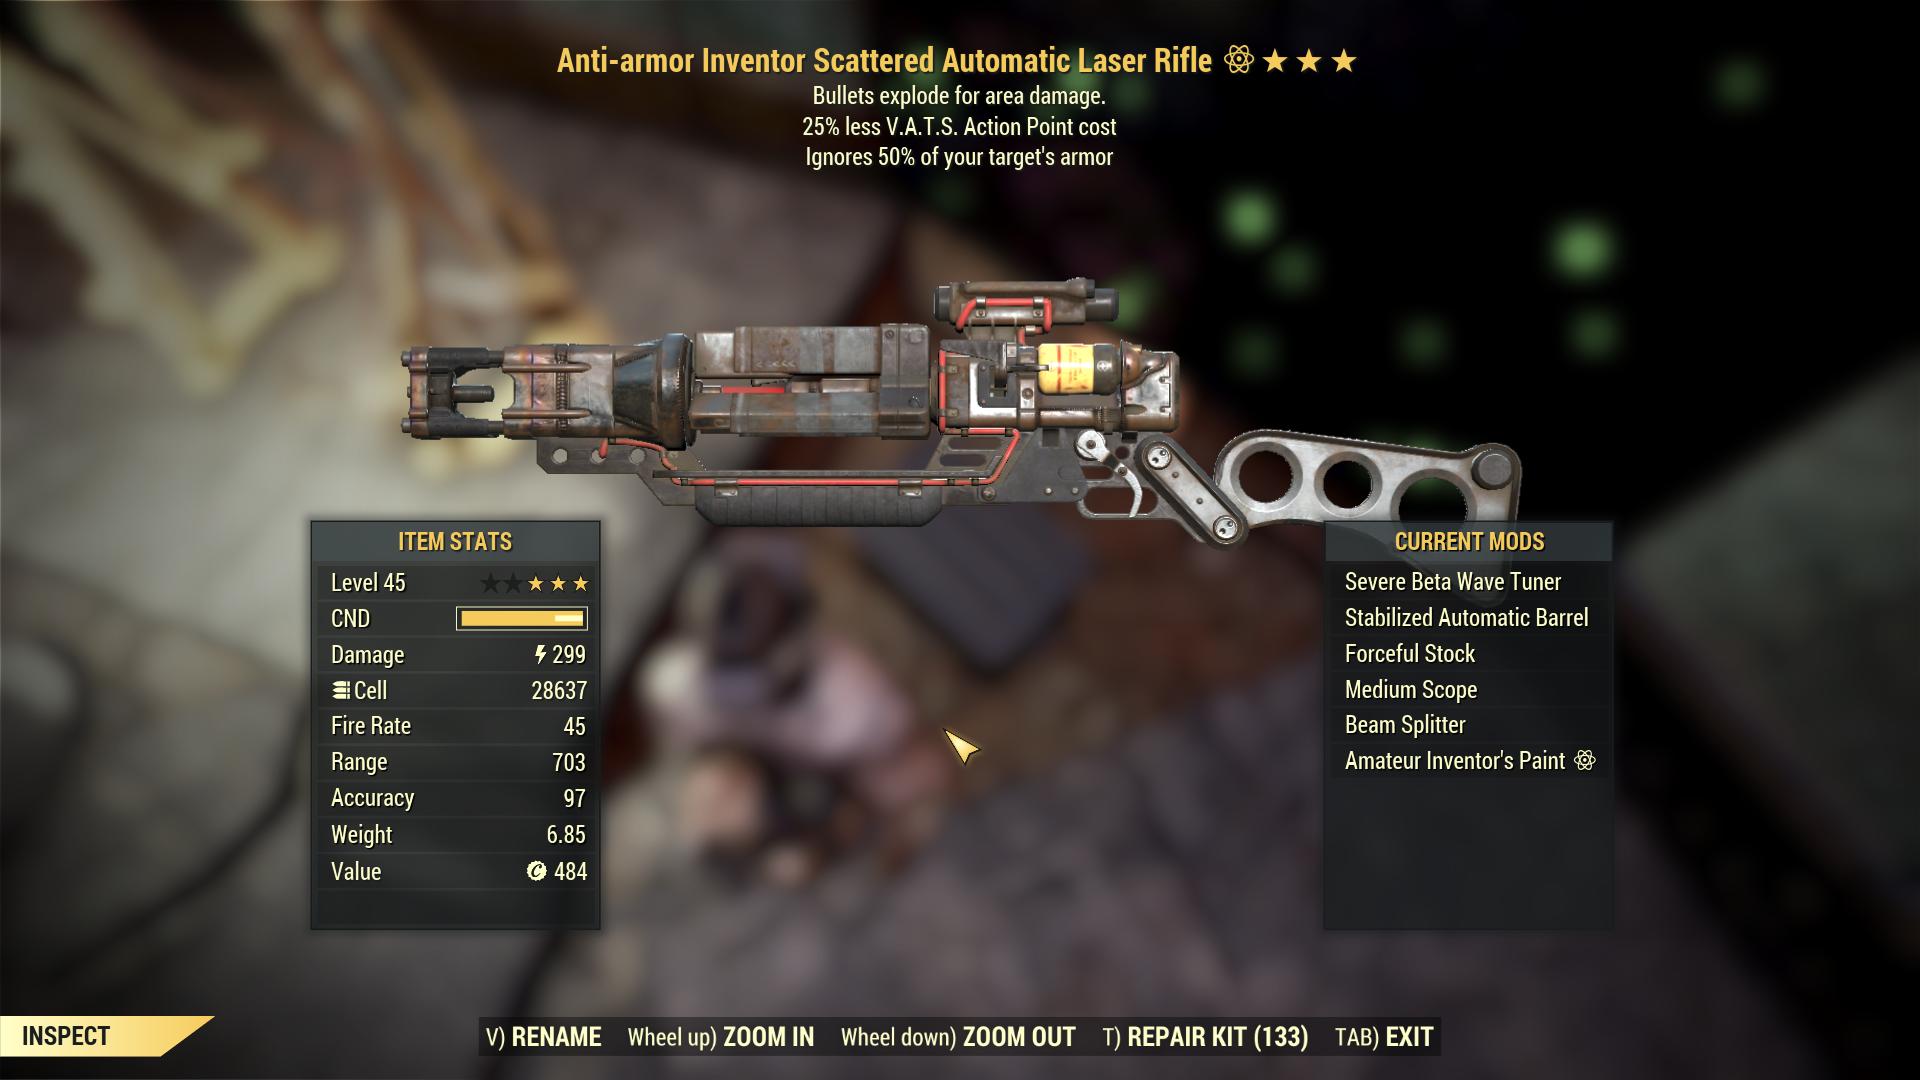 Anti-armor Explosive Laser Rifle 25% less vats AP cost HUGE DAMAGE and RANGE